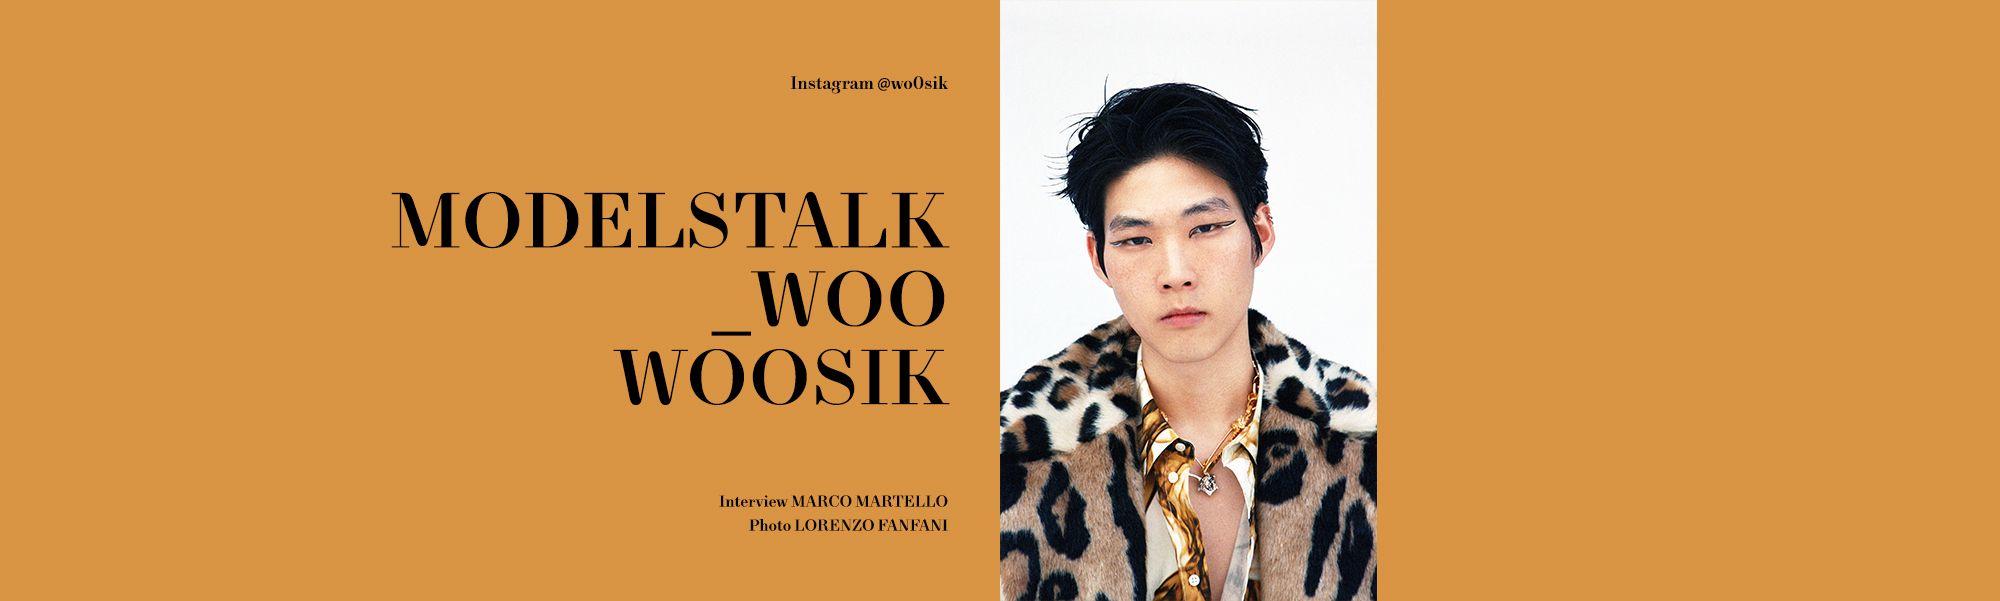 talking-heads-woo-woosik-thegreatestmagazine-banner